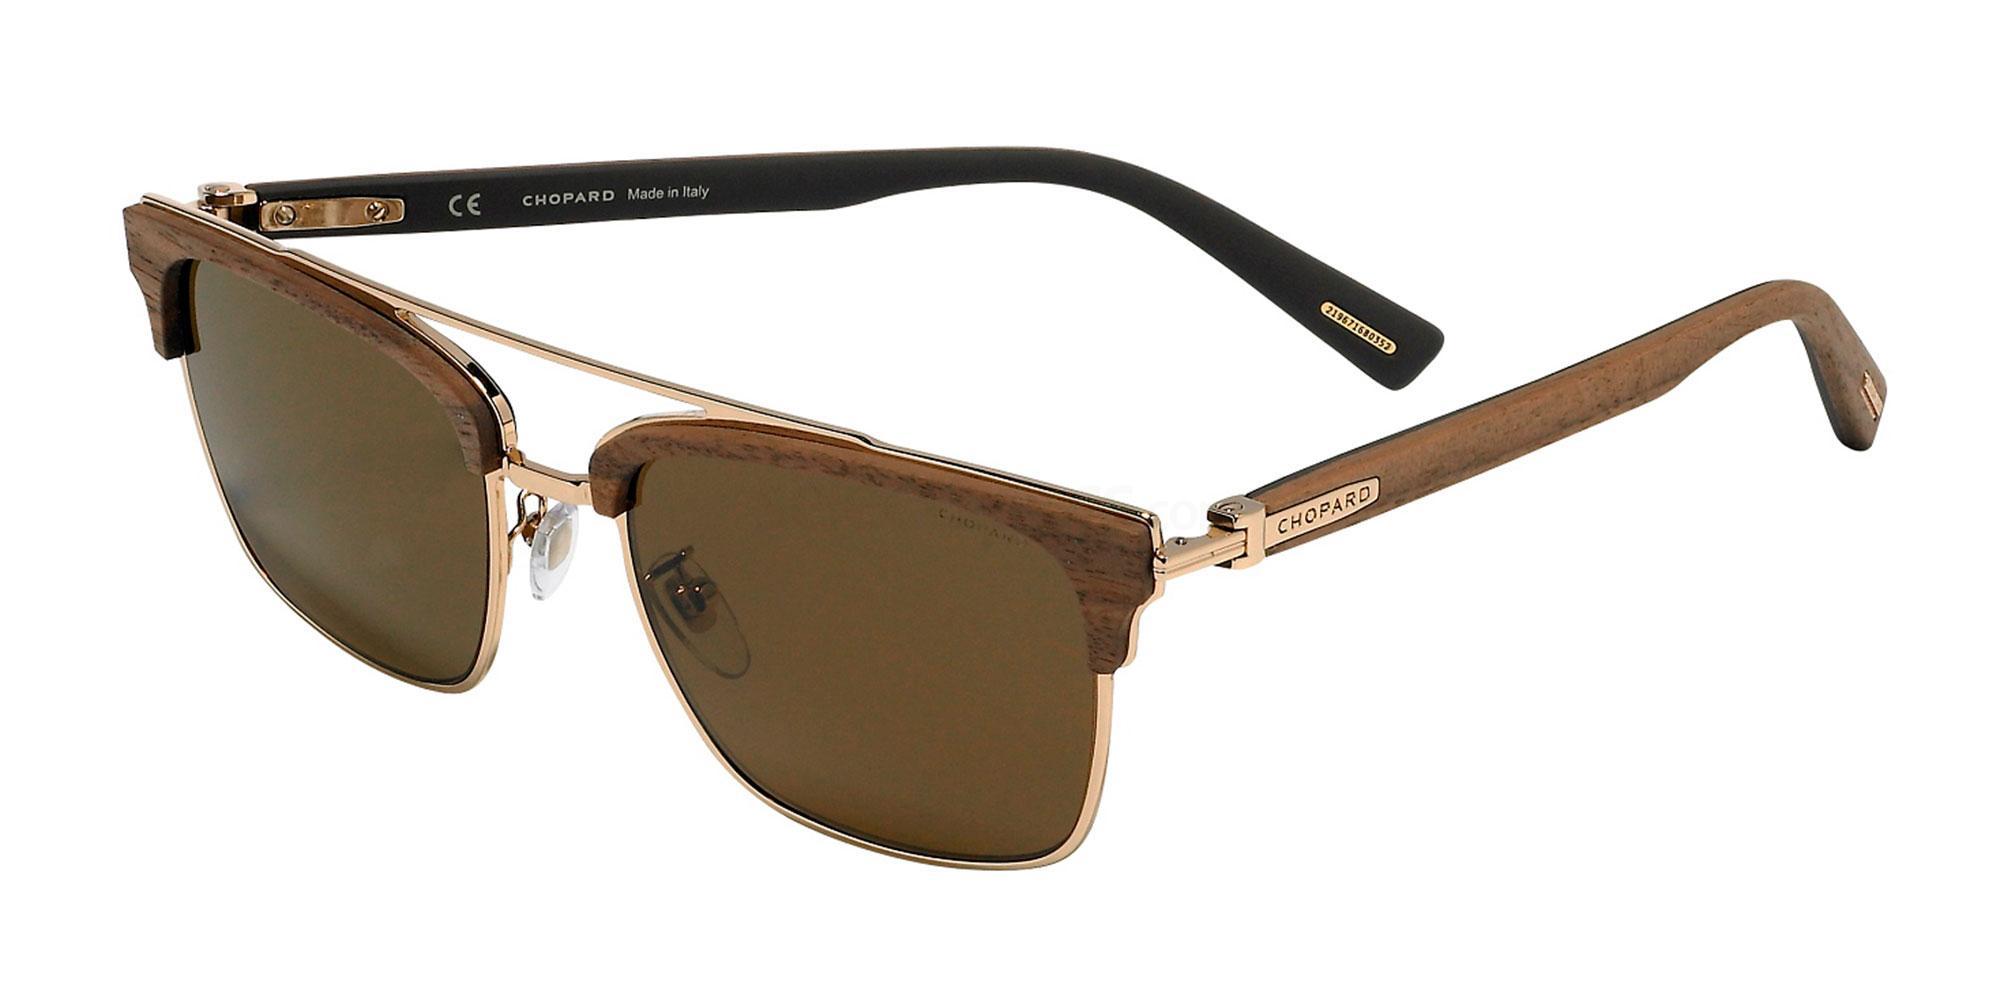 300Z SCHC90 Sunglasses, Chopard